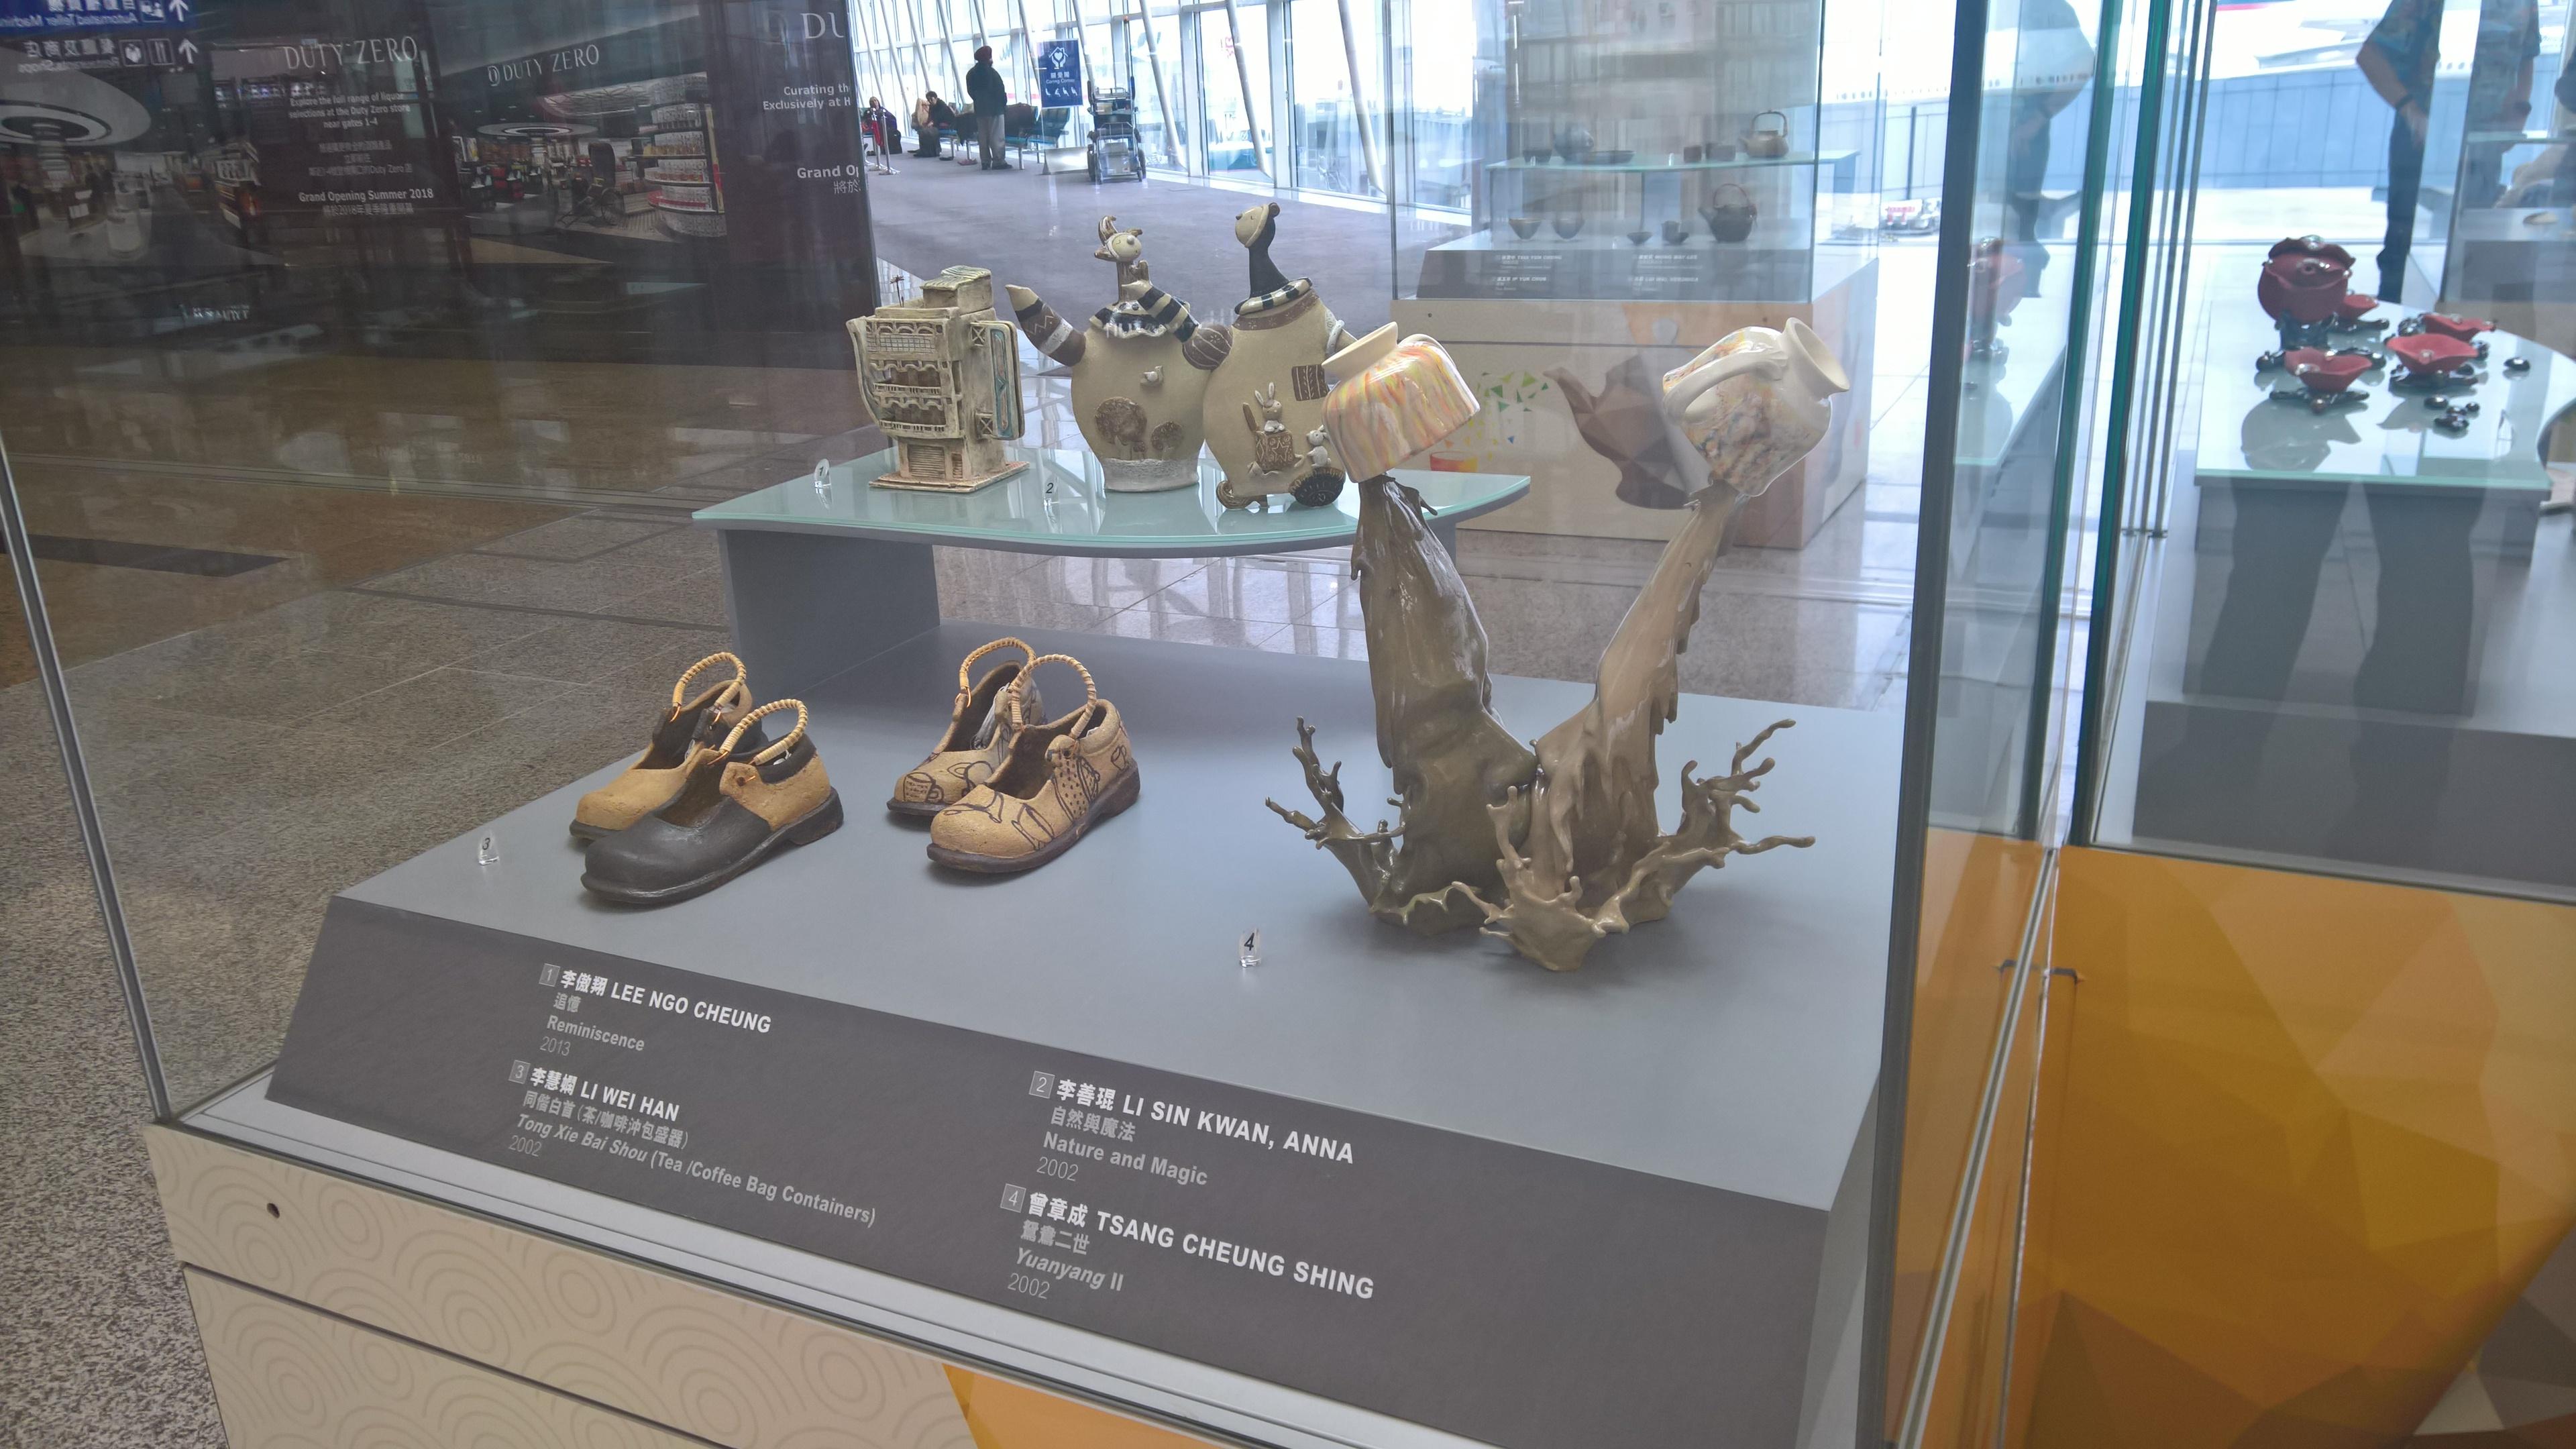 D Exhibition Hong Kong : File flagstaff house museum of tea ware public exhibition hong